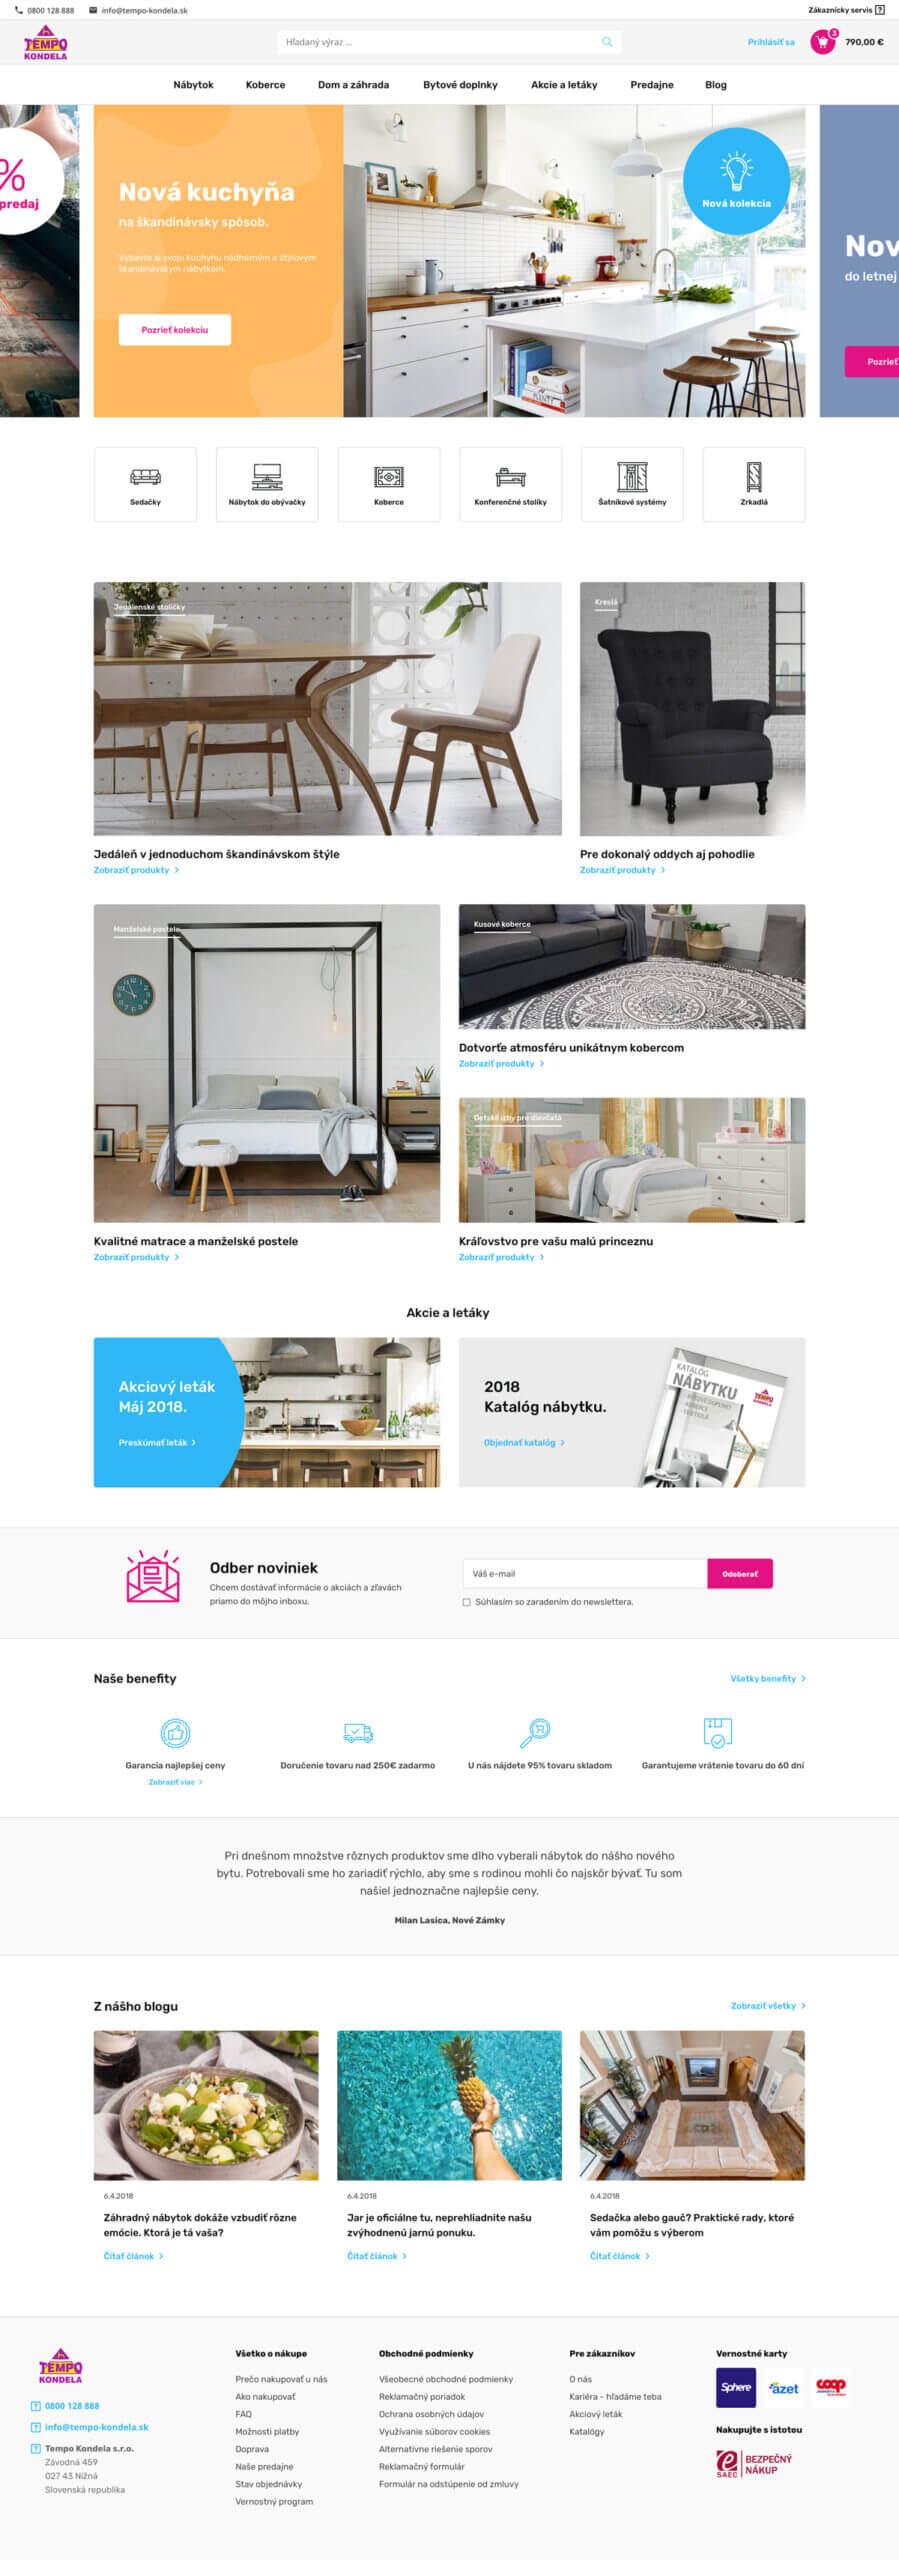 Homepage-v2